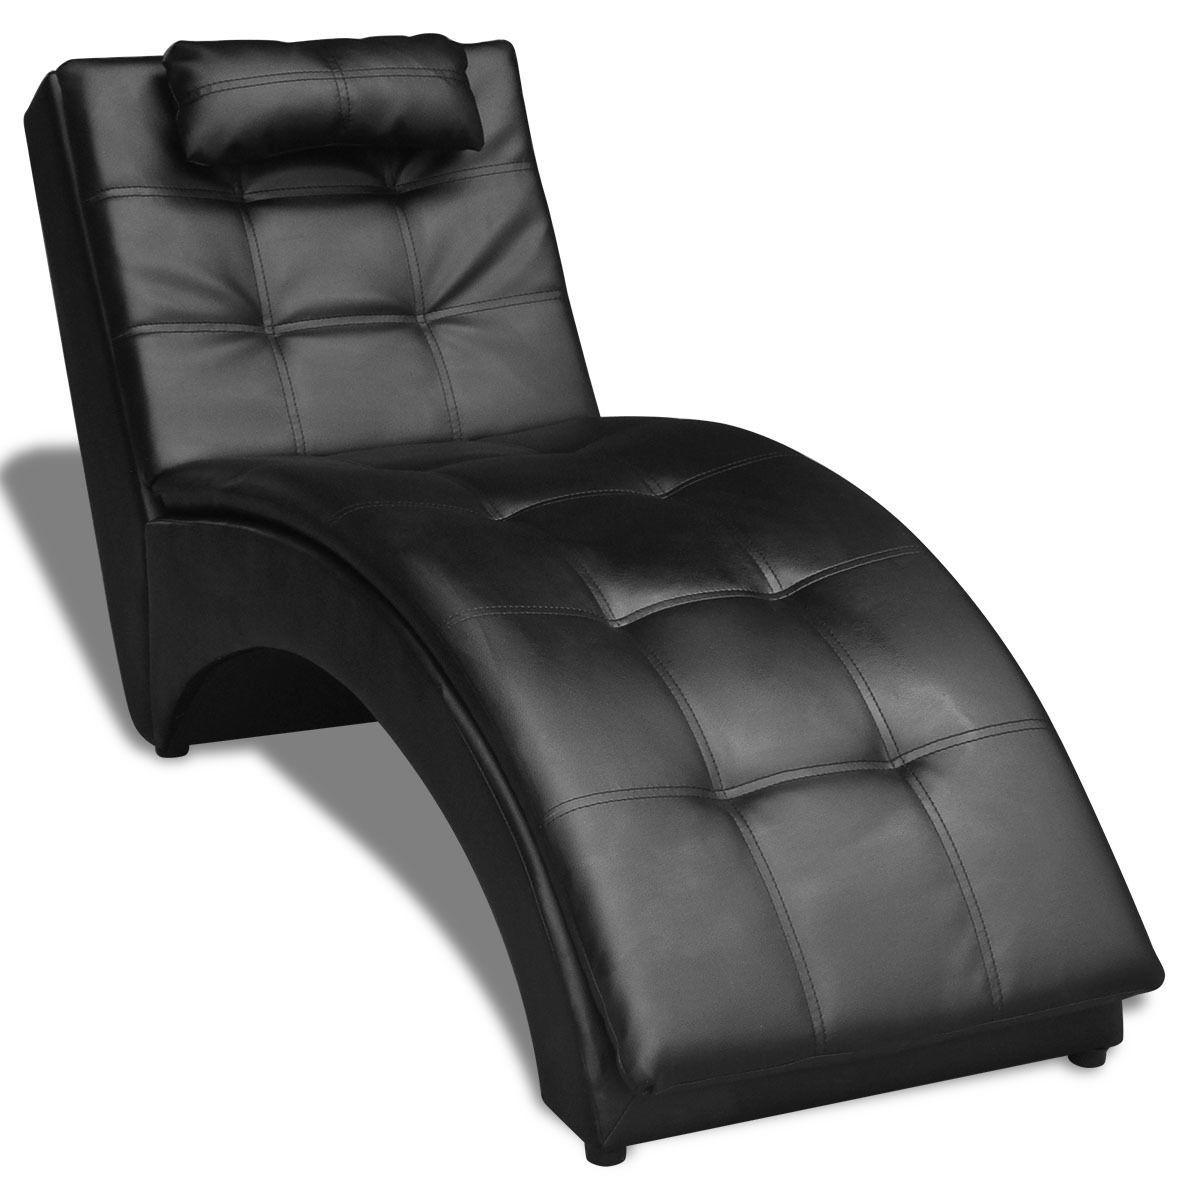 Cloud Mountain Leisure Chaise Lounge Sofa Chair Living Room Furniture